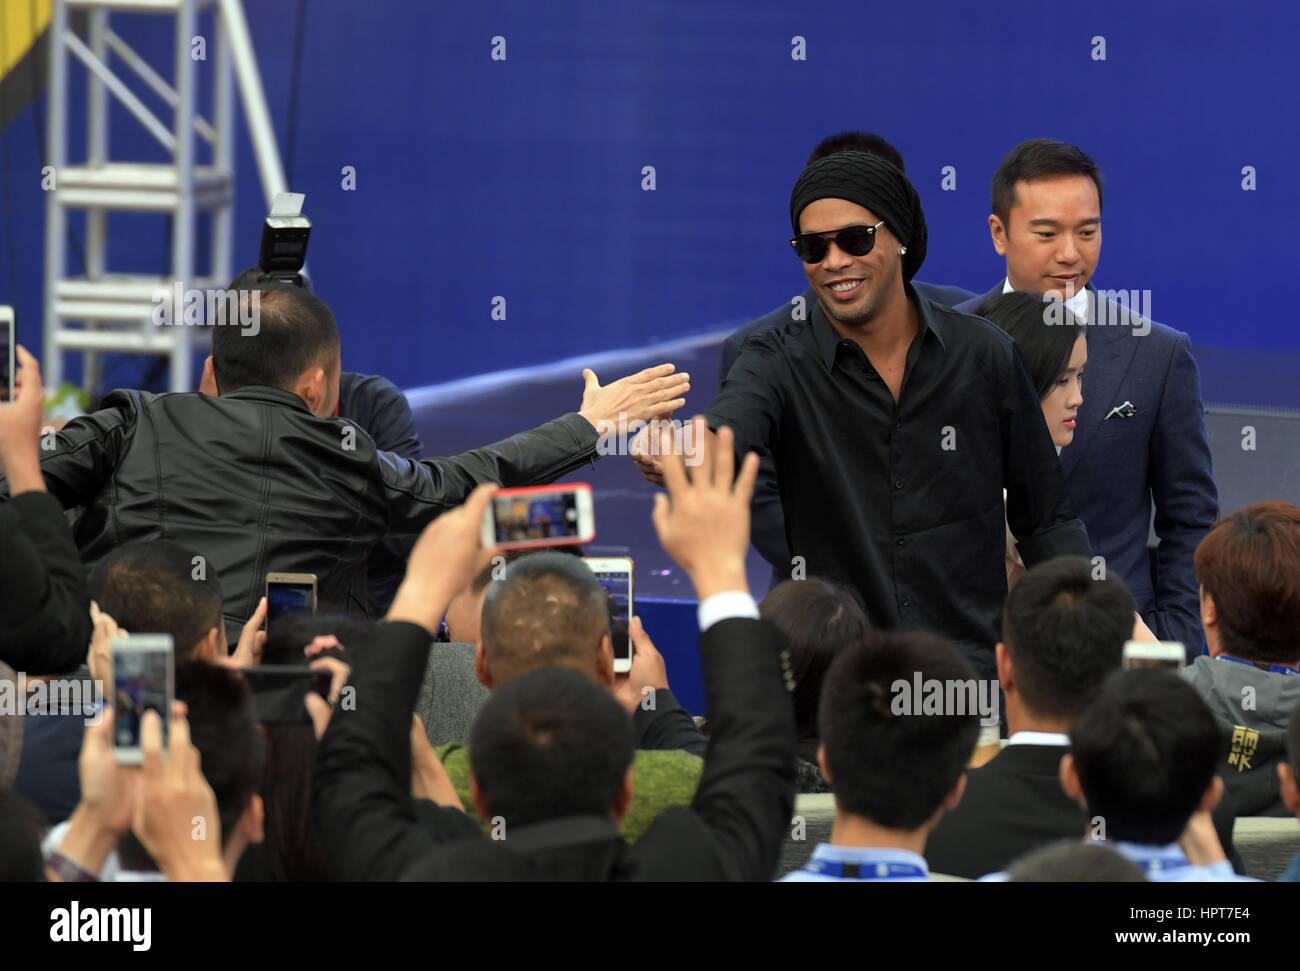 Haikou, China's Hainan Province. 24th Feb, 2017. Club Ambassador of Futbol Club Barcelona (FCB) Ronaldinho greets - Stock Image